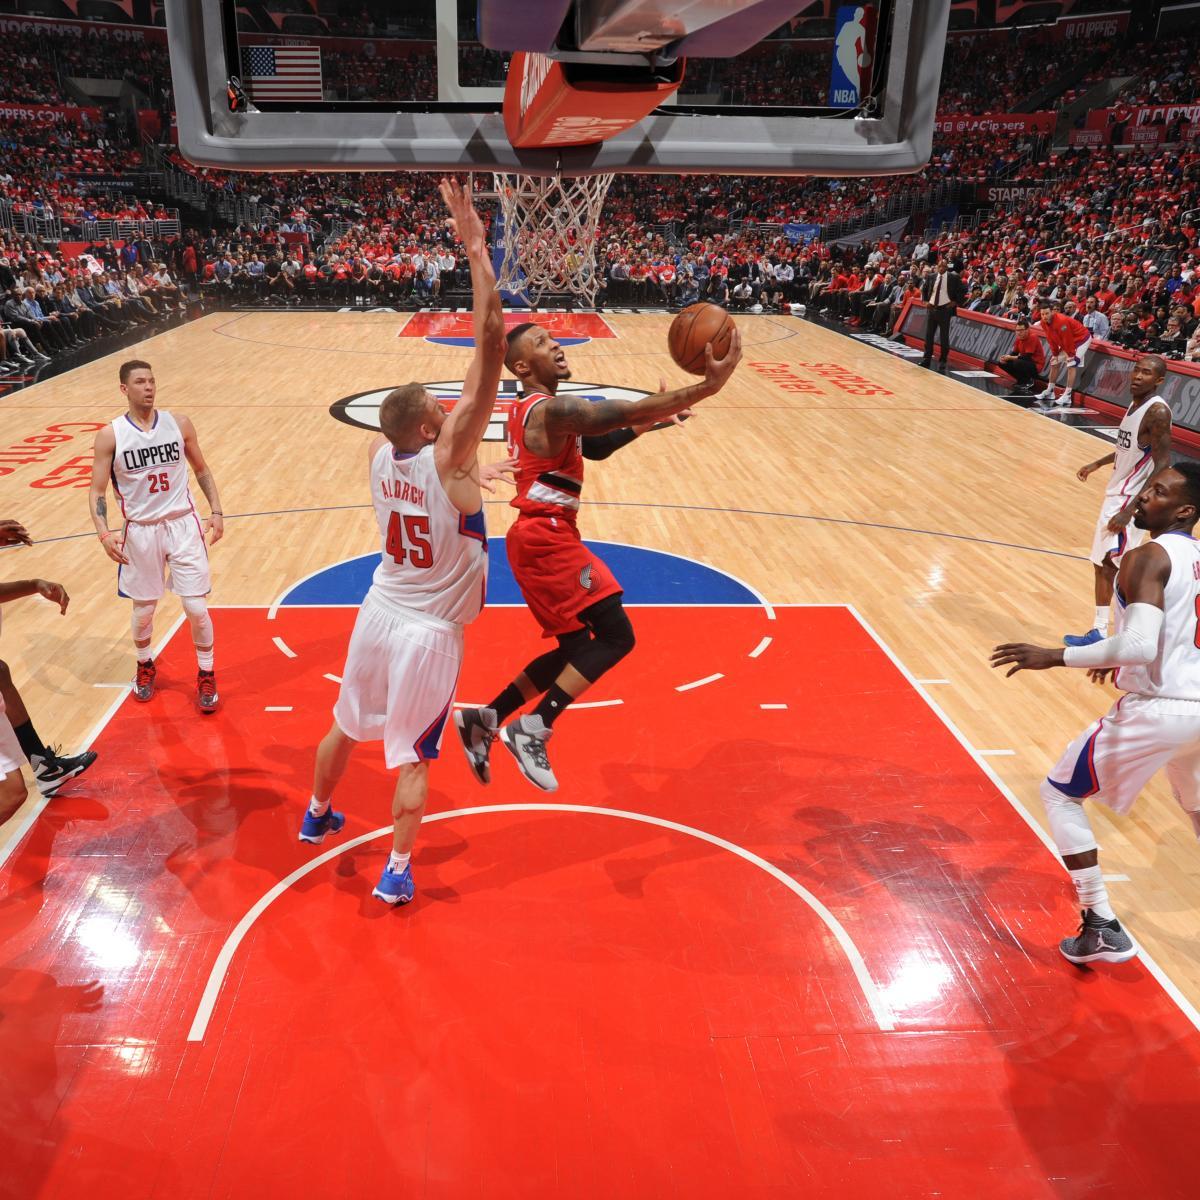 Portland Blazers Game Score: Trail Blazers Vs. Clippers: Game 5 Score, Twitter Reaction